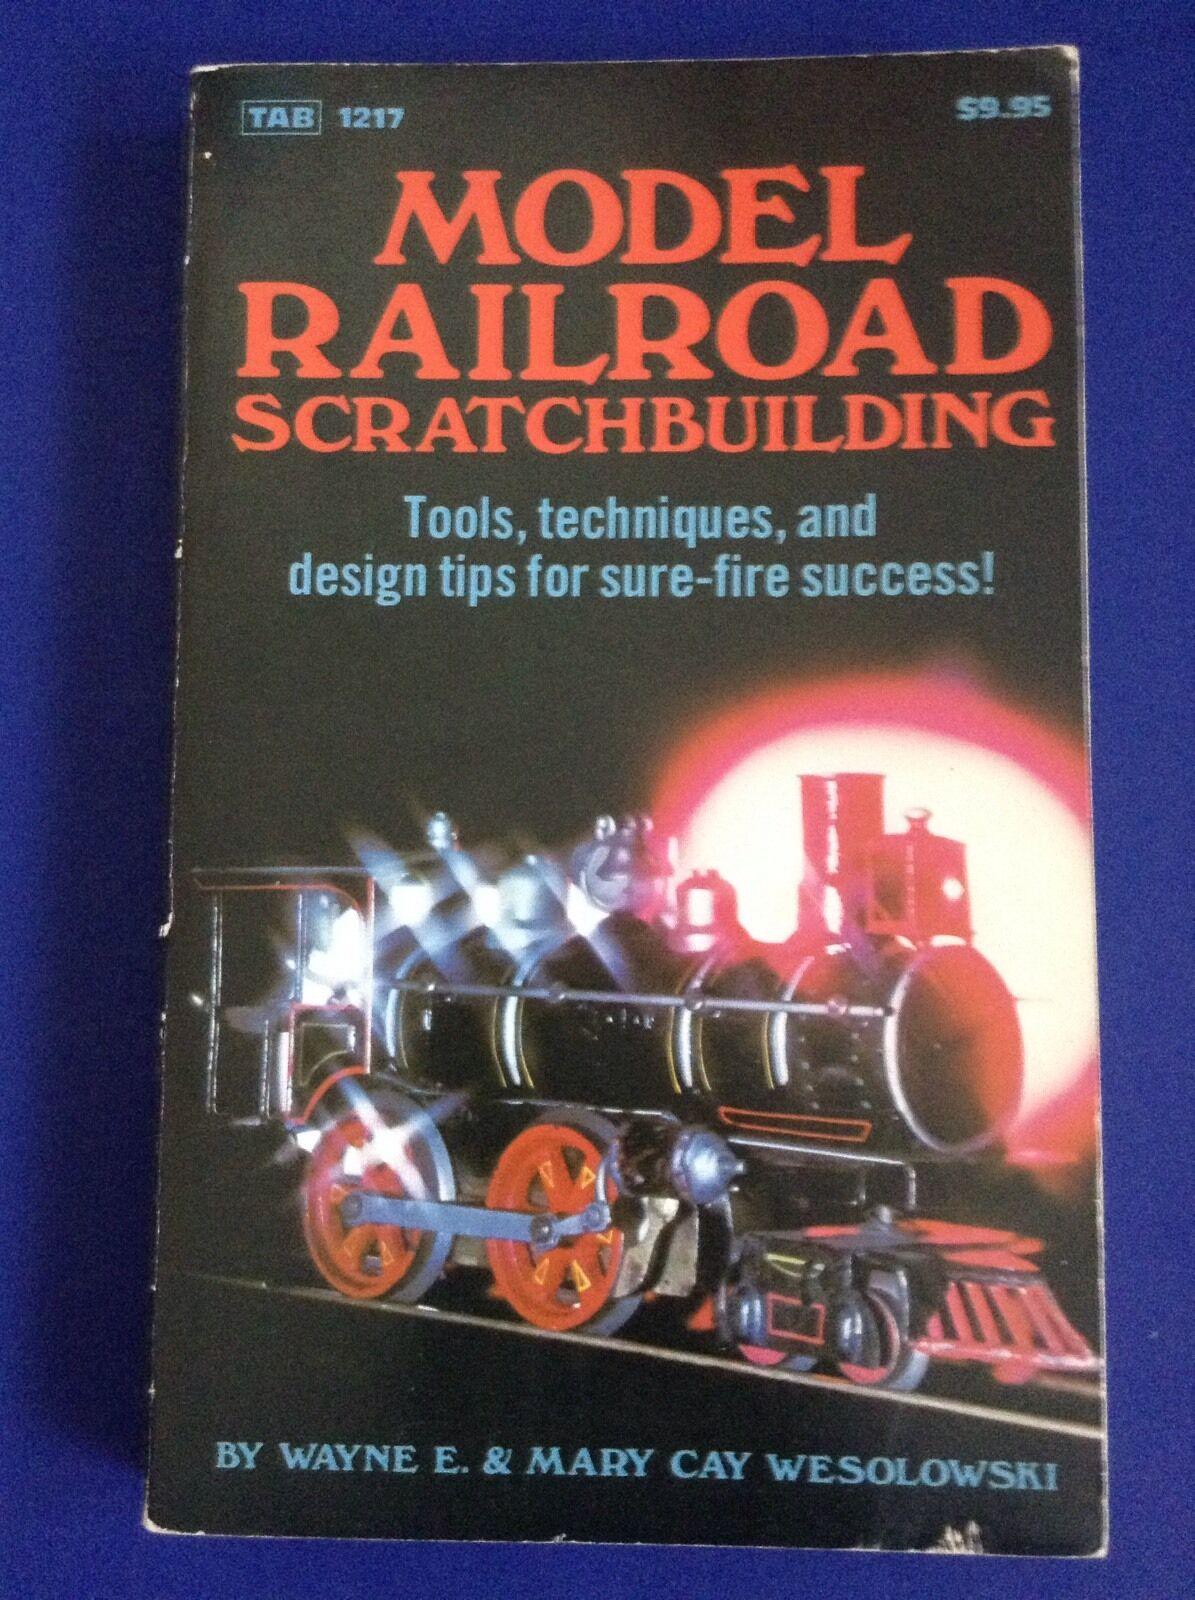 Model Railroad Scratchbuilding Bk Wesolowski 1981 Tab  1217 Train Sets 1st ed